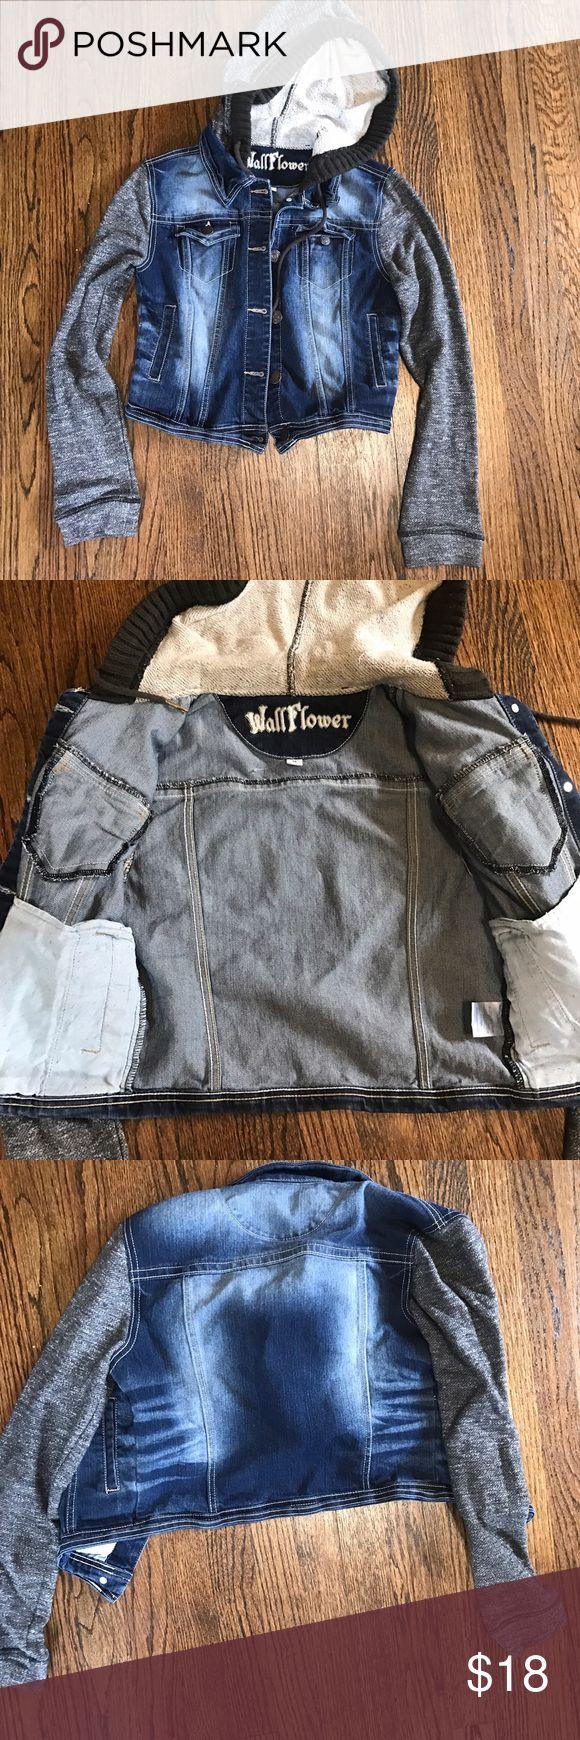 Hooded jean jacket EUC has only been worn a few times Wallflower Jackets & Coats